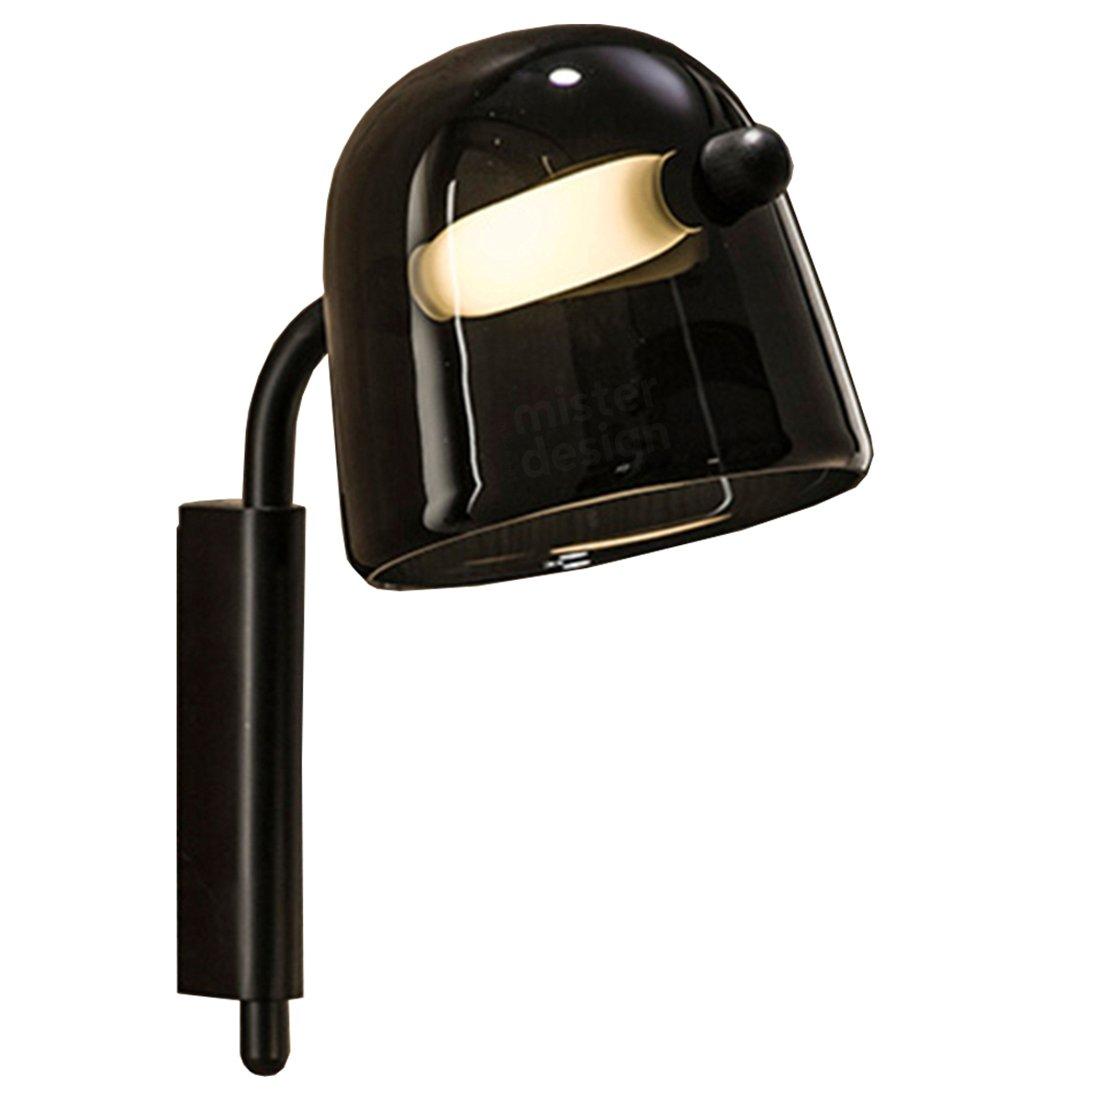 Brokis Mona Wandlamp Medium - Zwart glas Zwarte Body